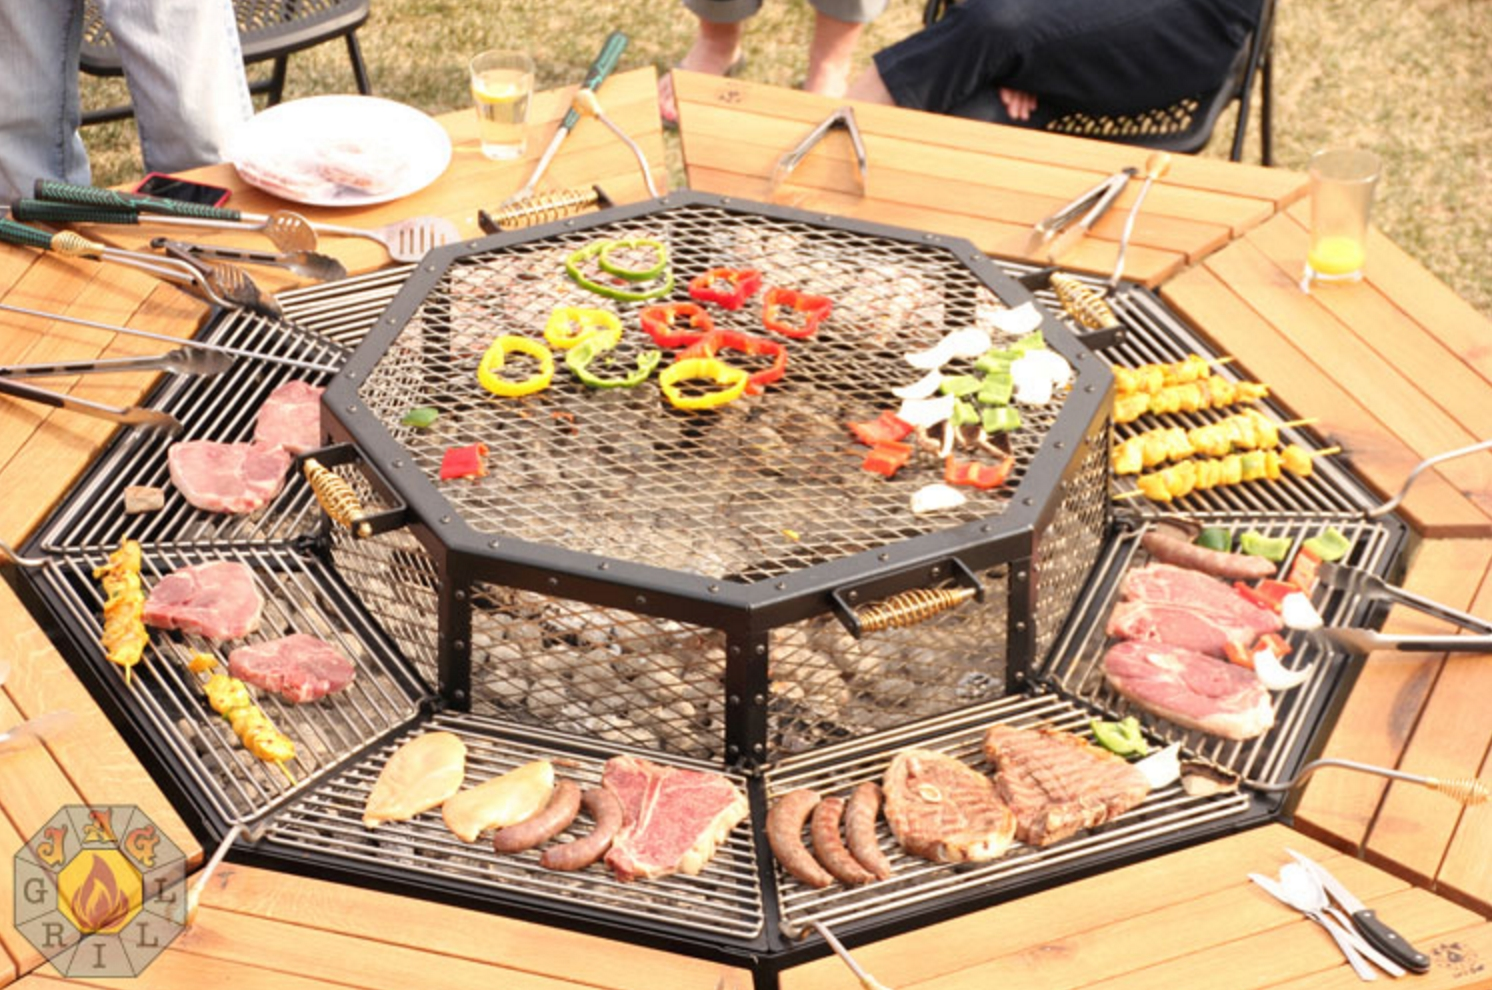 idees pour barbecue #14: fabriquer-un-barbecue-facile-idee-brico-diy